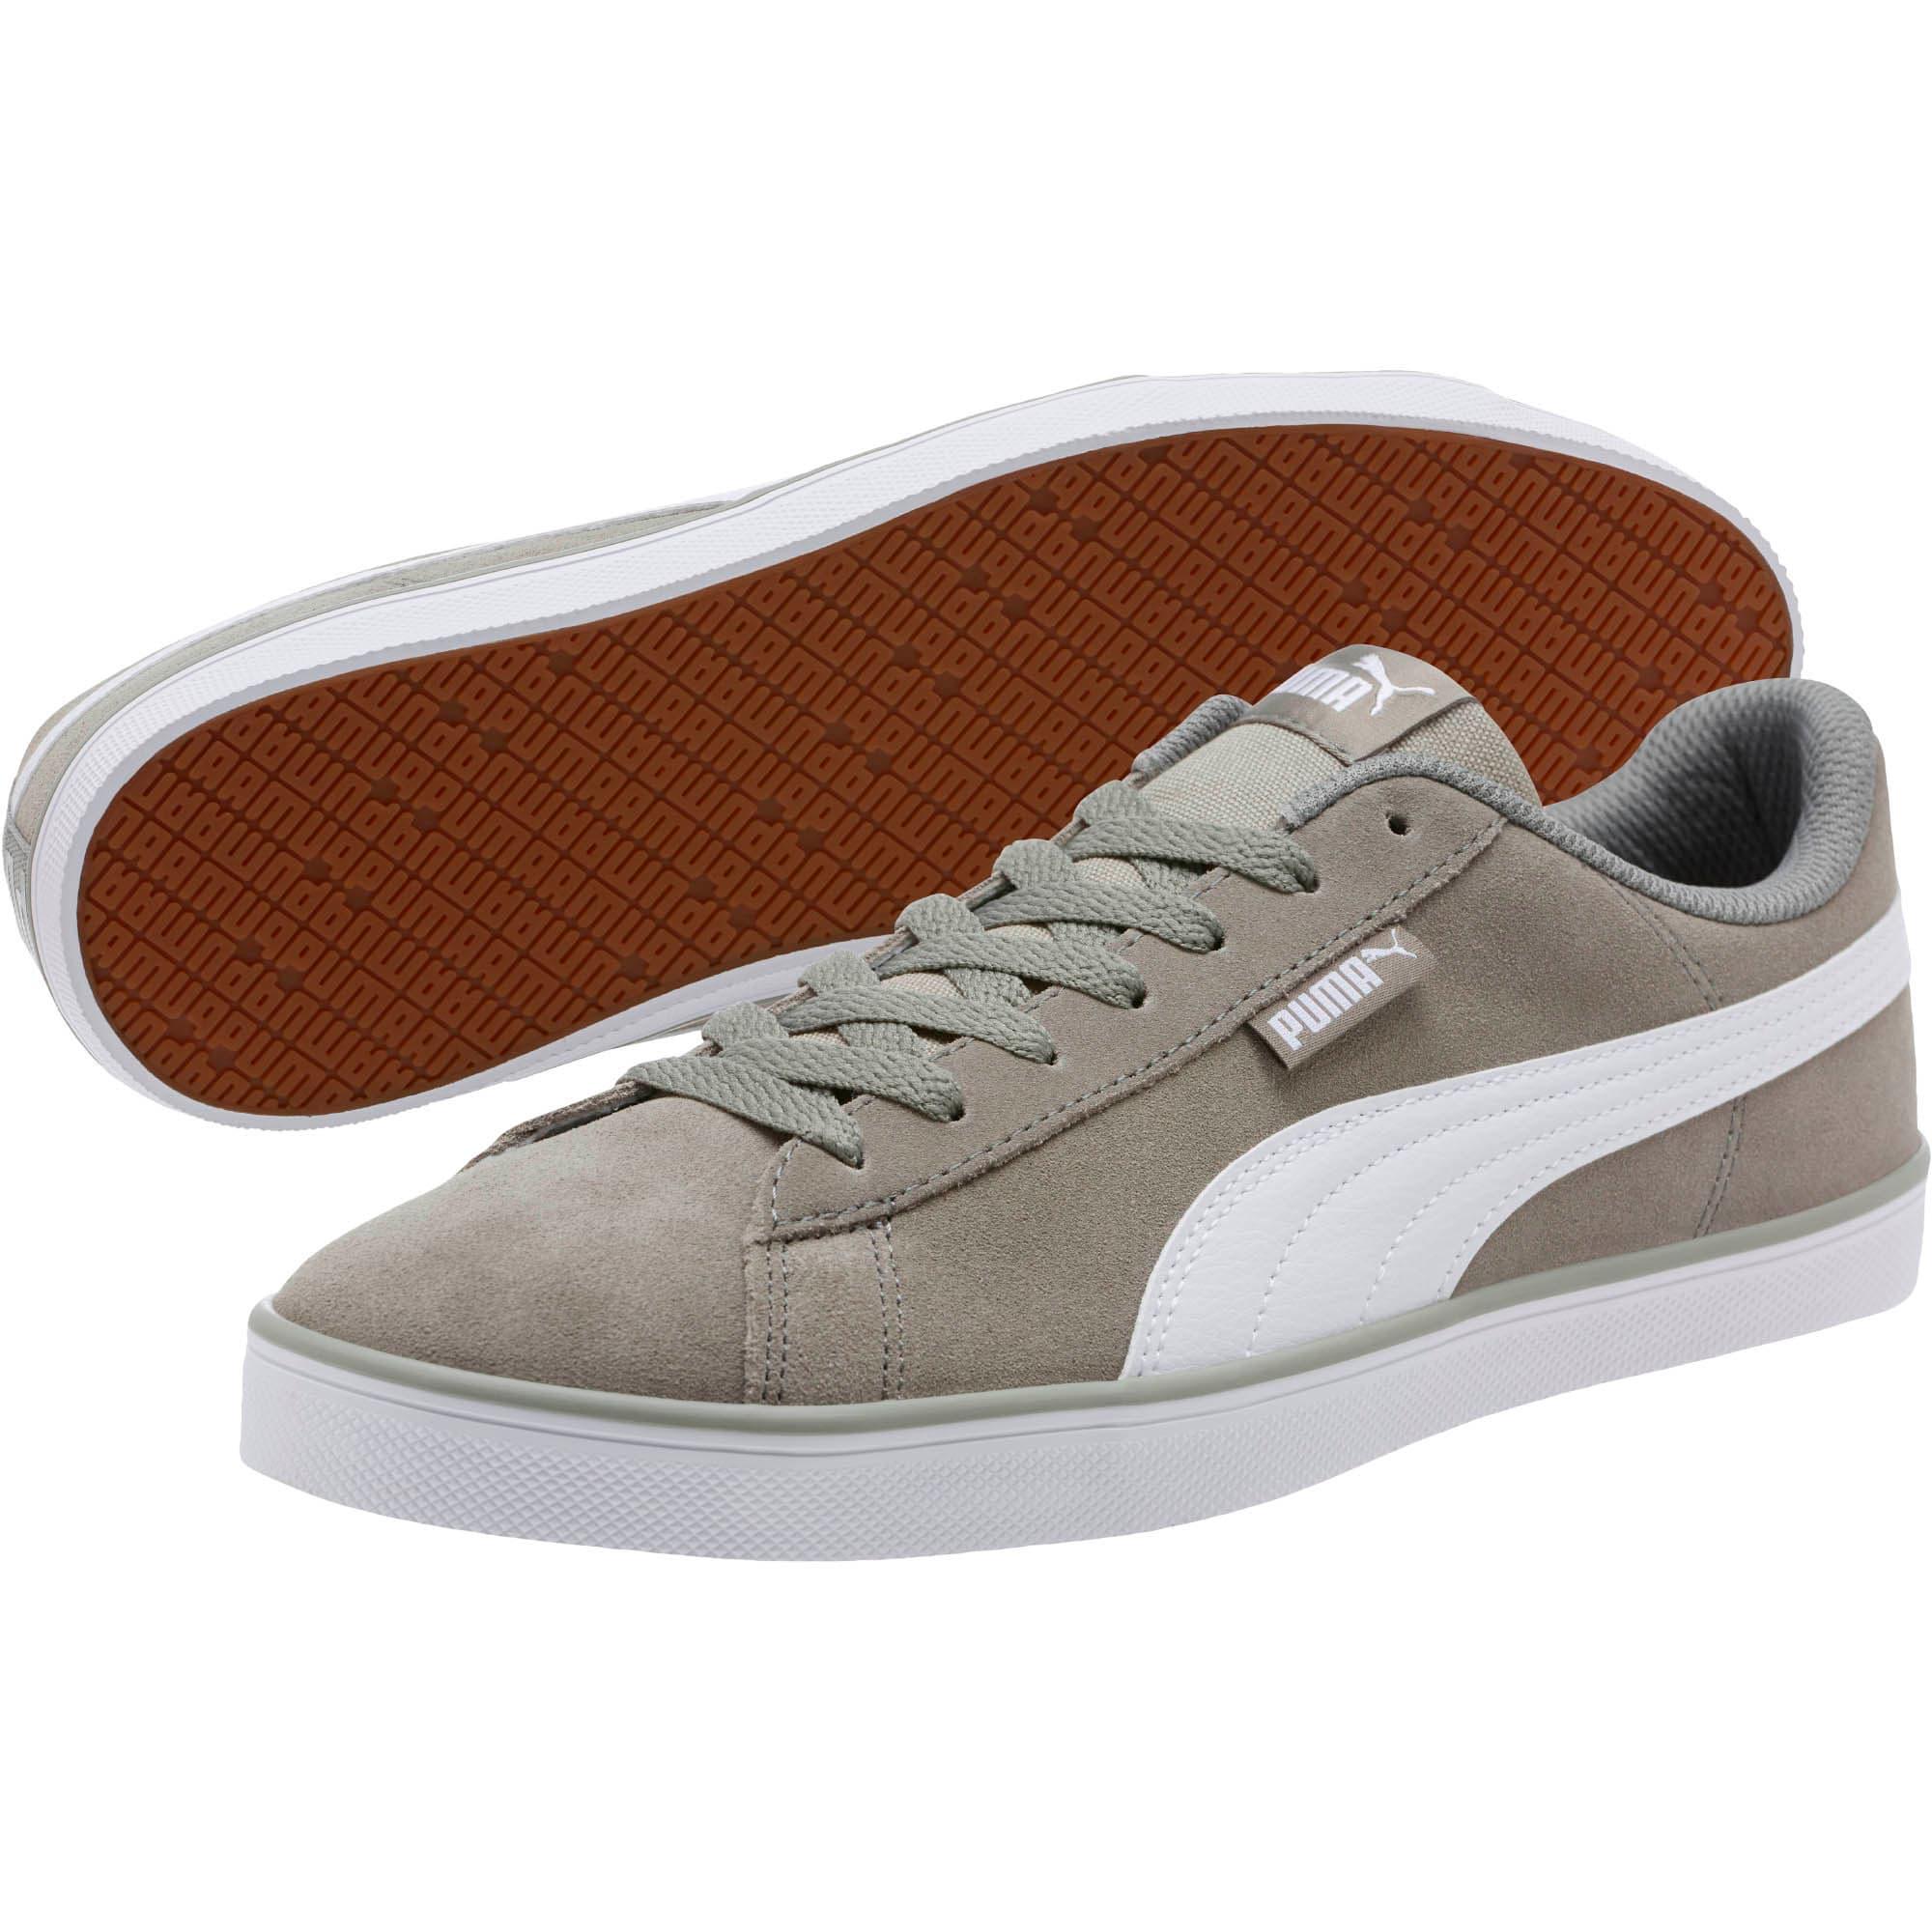 Thumbnail 2 of Urban Plus Suede Sneakers, Rock Ridge-Puma White, medium